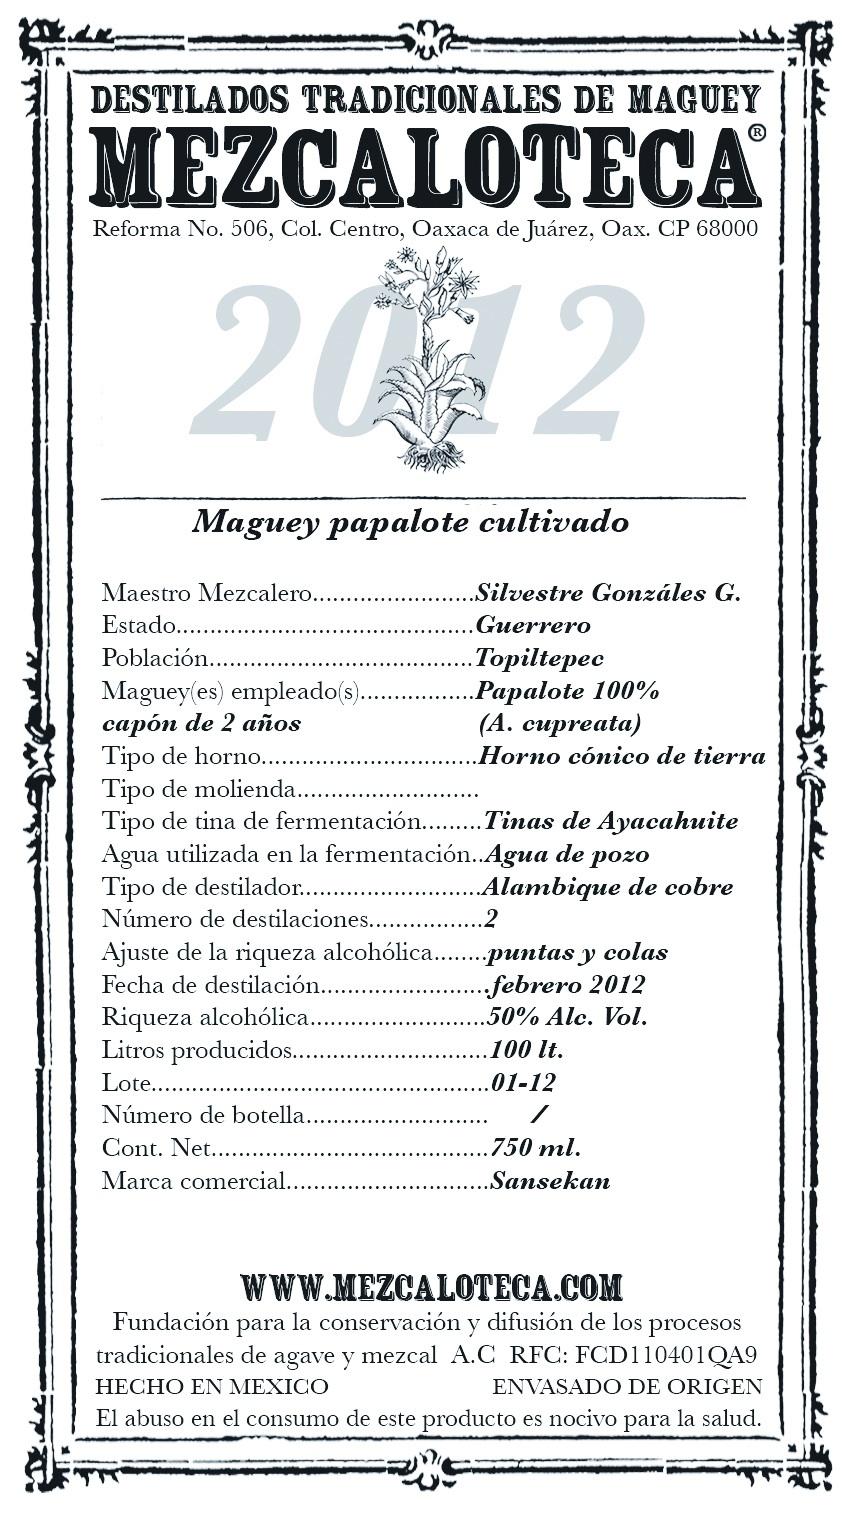 papalote.cultivado.SG.2012.750.sansekan[1]_1 web.jpg